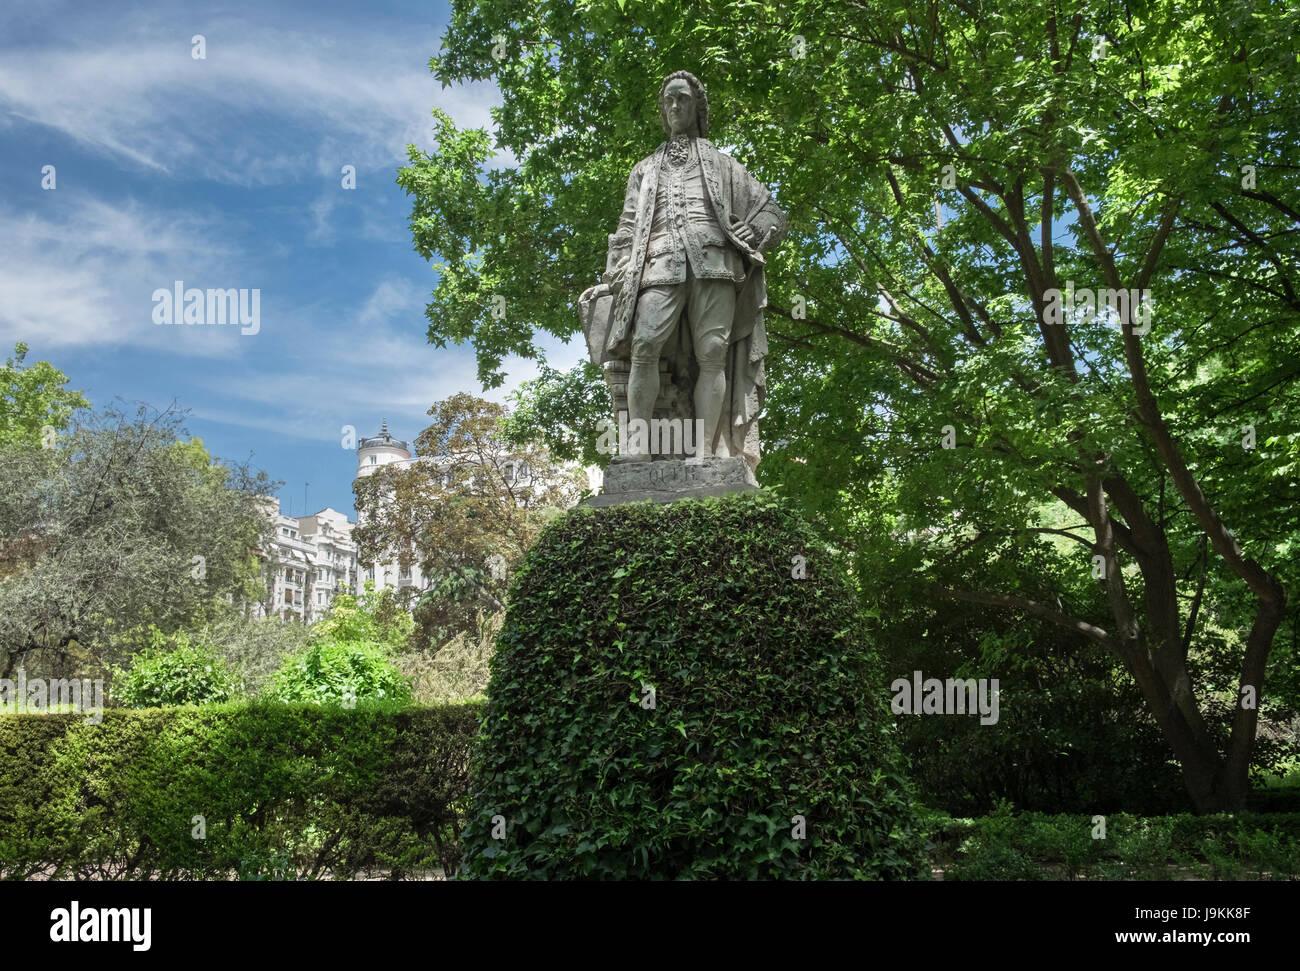 A statue displayed inside Real Jardin Botanico (Royal Botanic Garden), Madrid, Spain - Stock Image